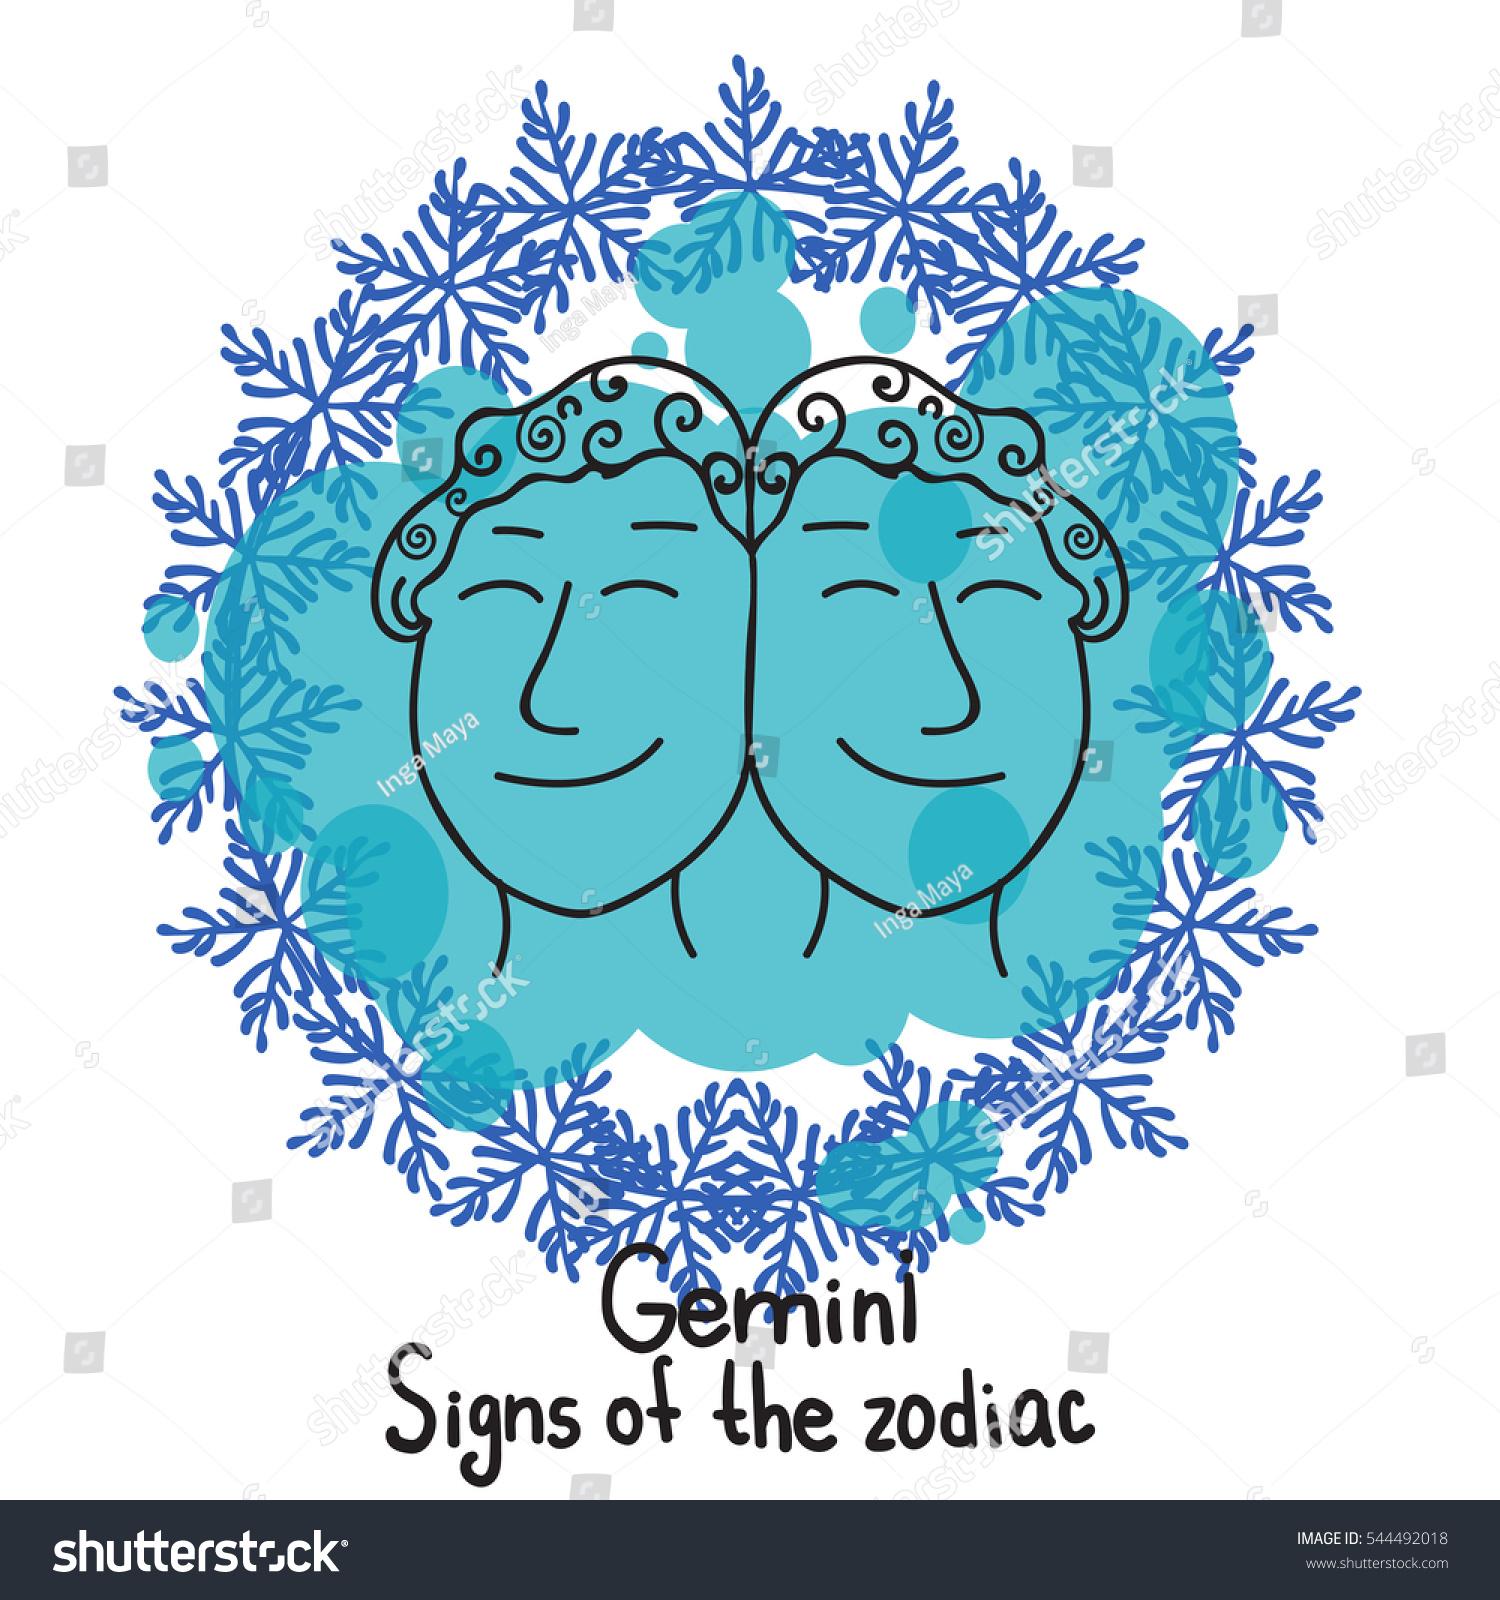 Signs zodiac horoscope hand drawing gemini stock vector 544492018 signs of the zodiac horoscope hand drawing gemini symbol winter frame of snowflakes buycottarizona